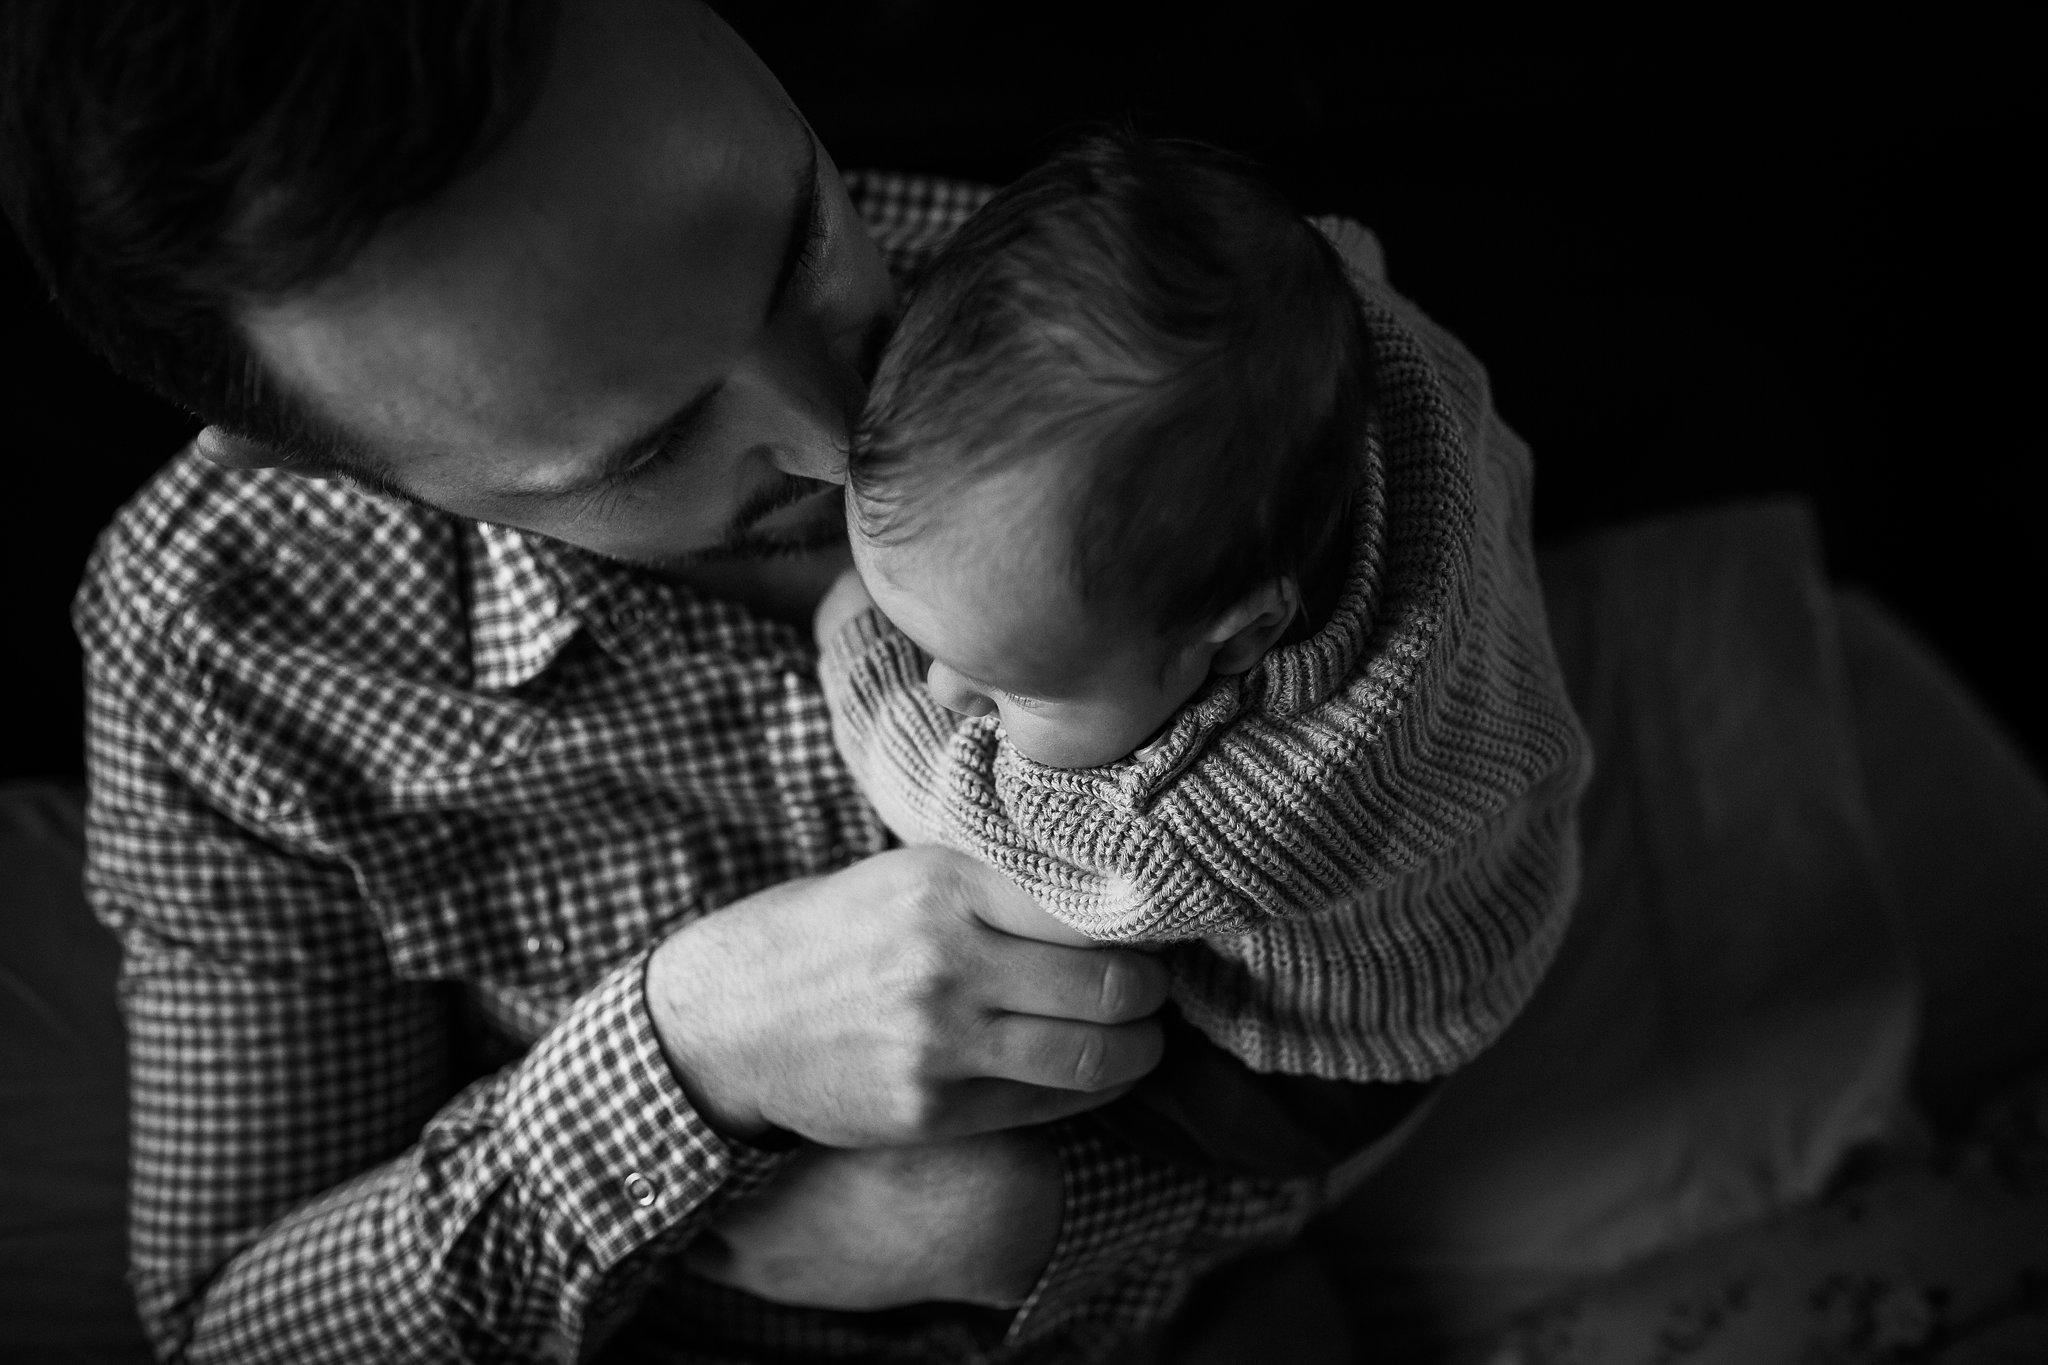 newborn-baby-in-home-family-photography-albury-wodonga-north-east-victoria (7).jpg